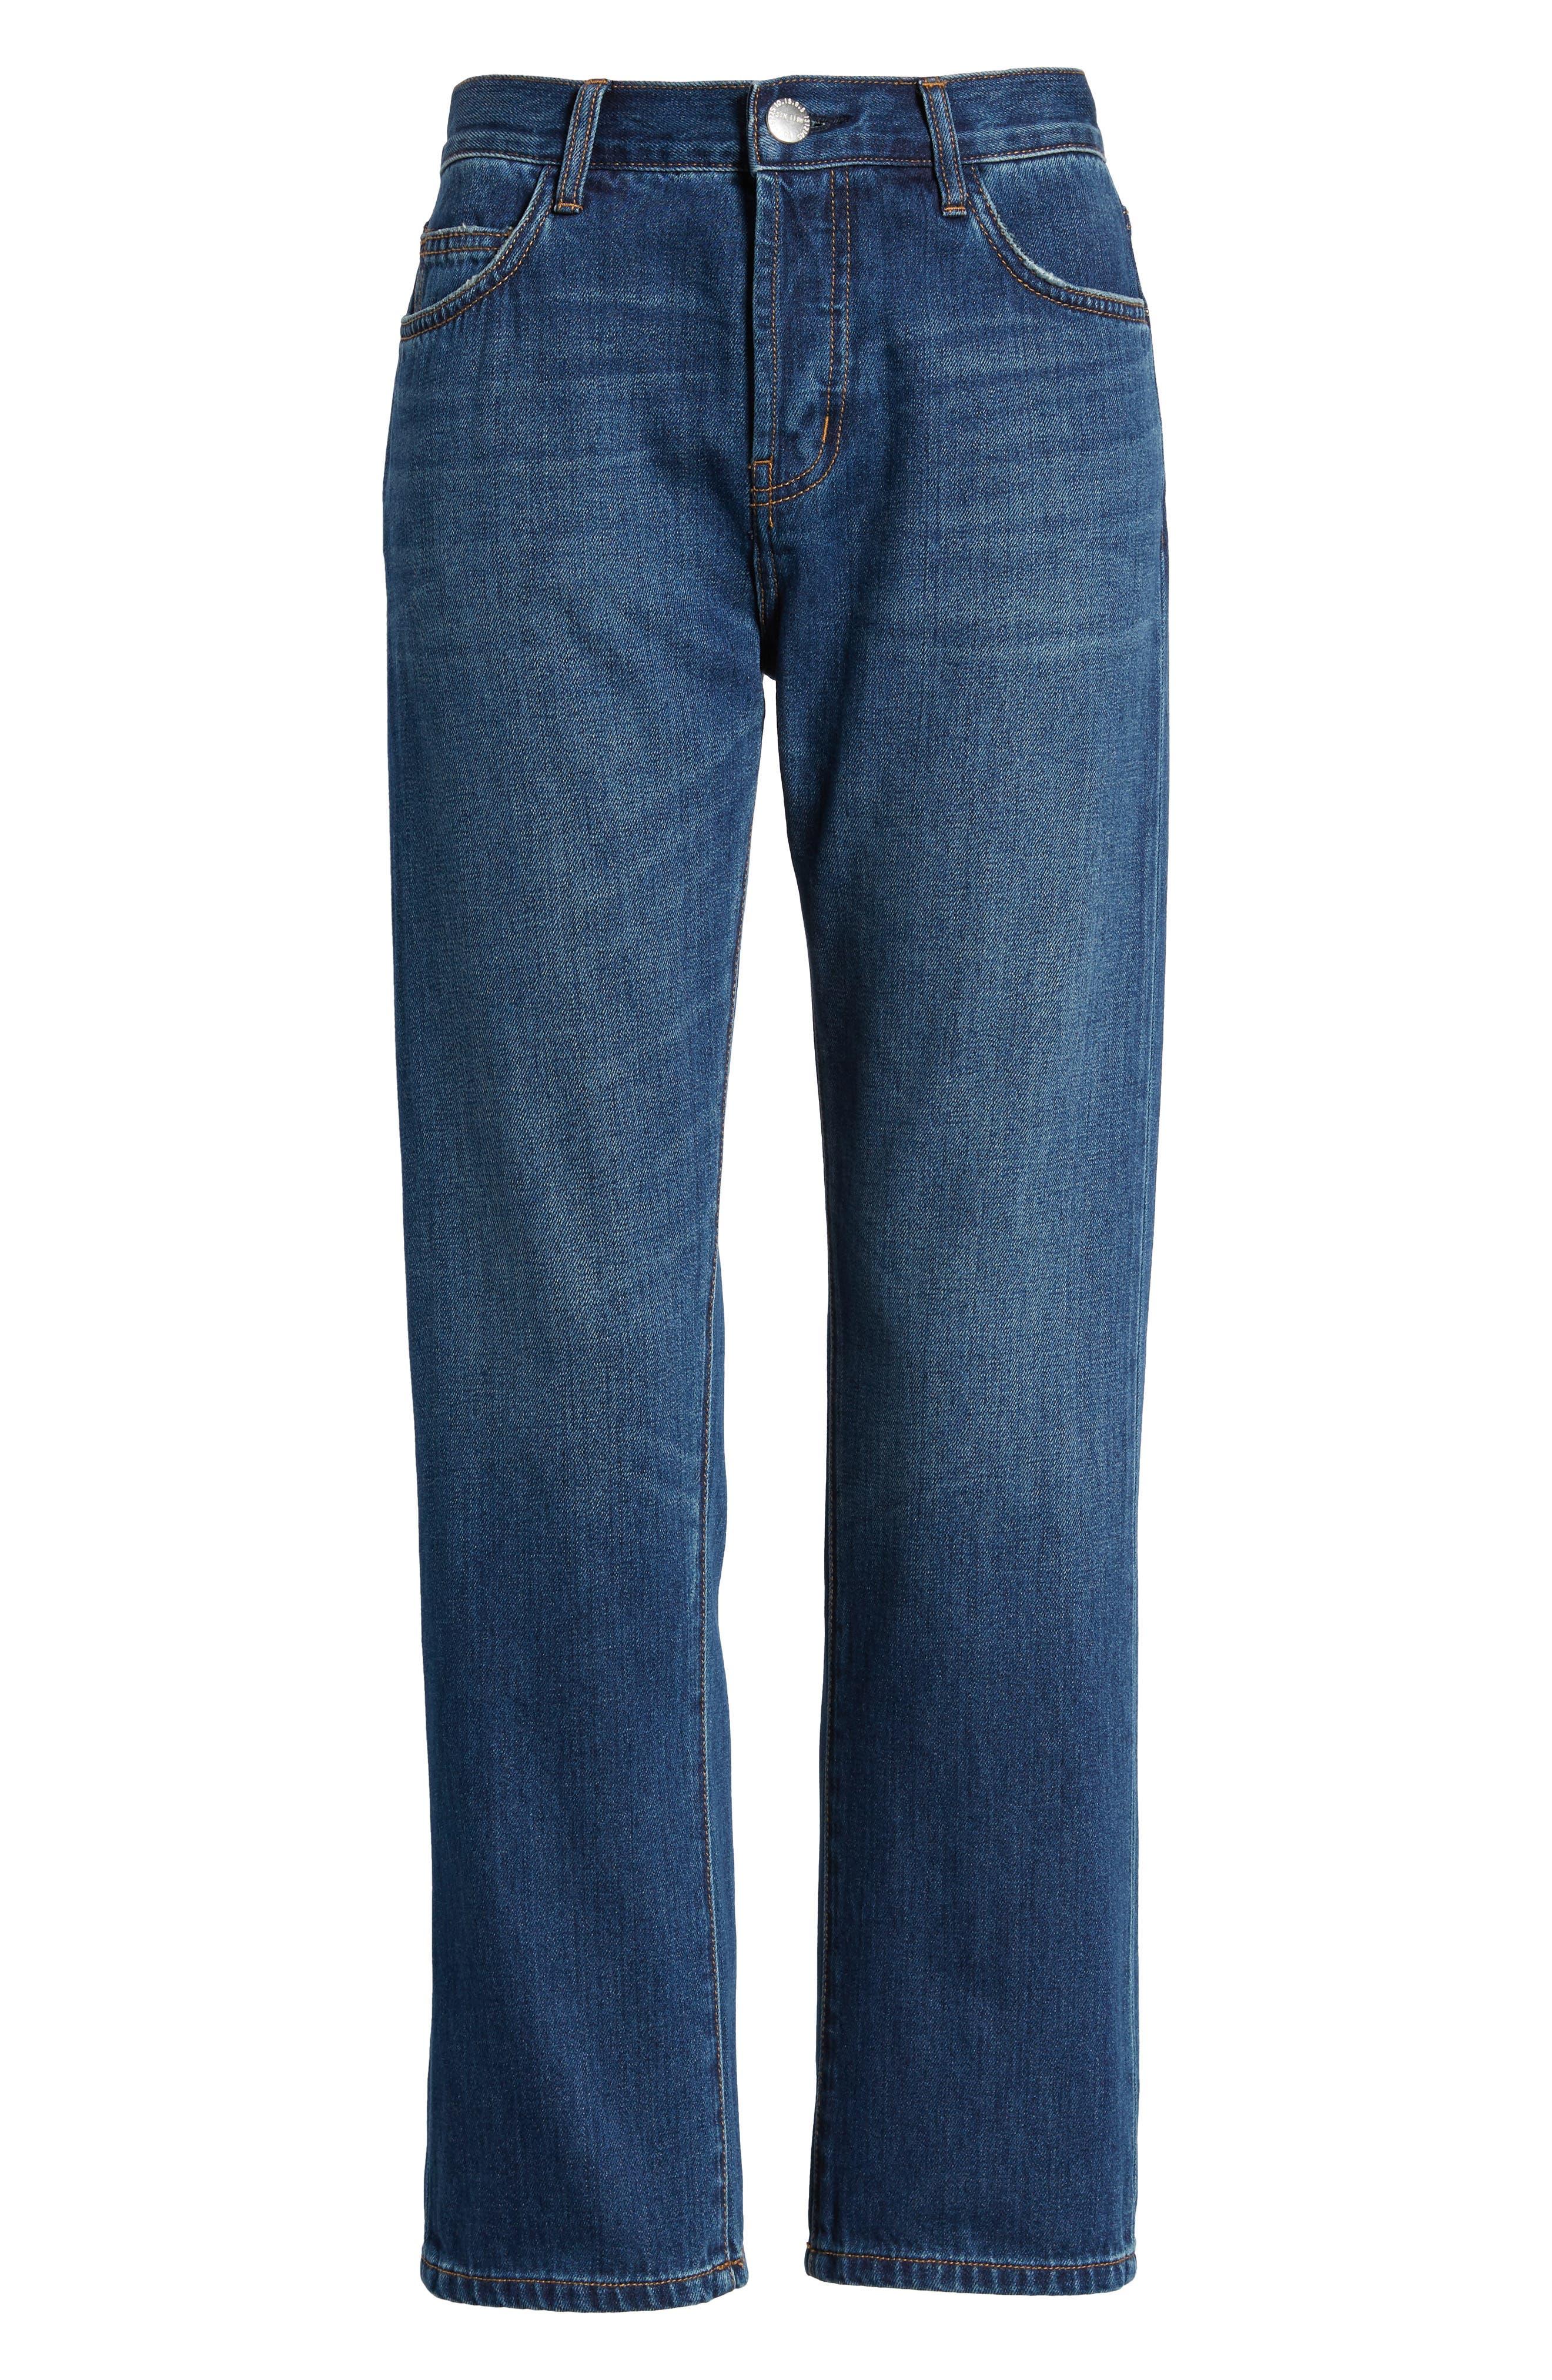 The Original Straight Leg Jeans,                             Alternate thumbnail 7, color,                             472